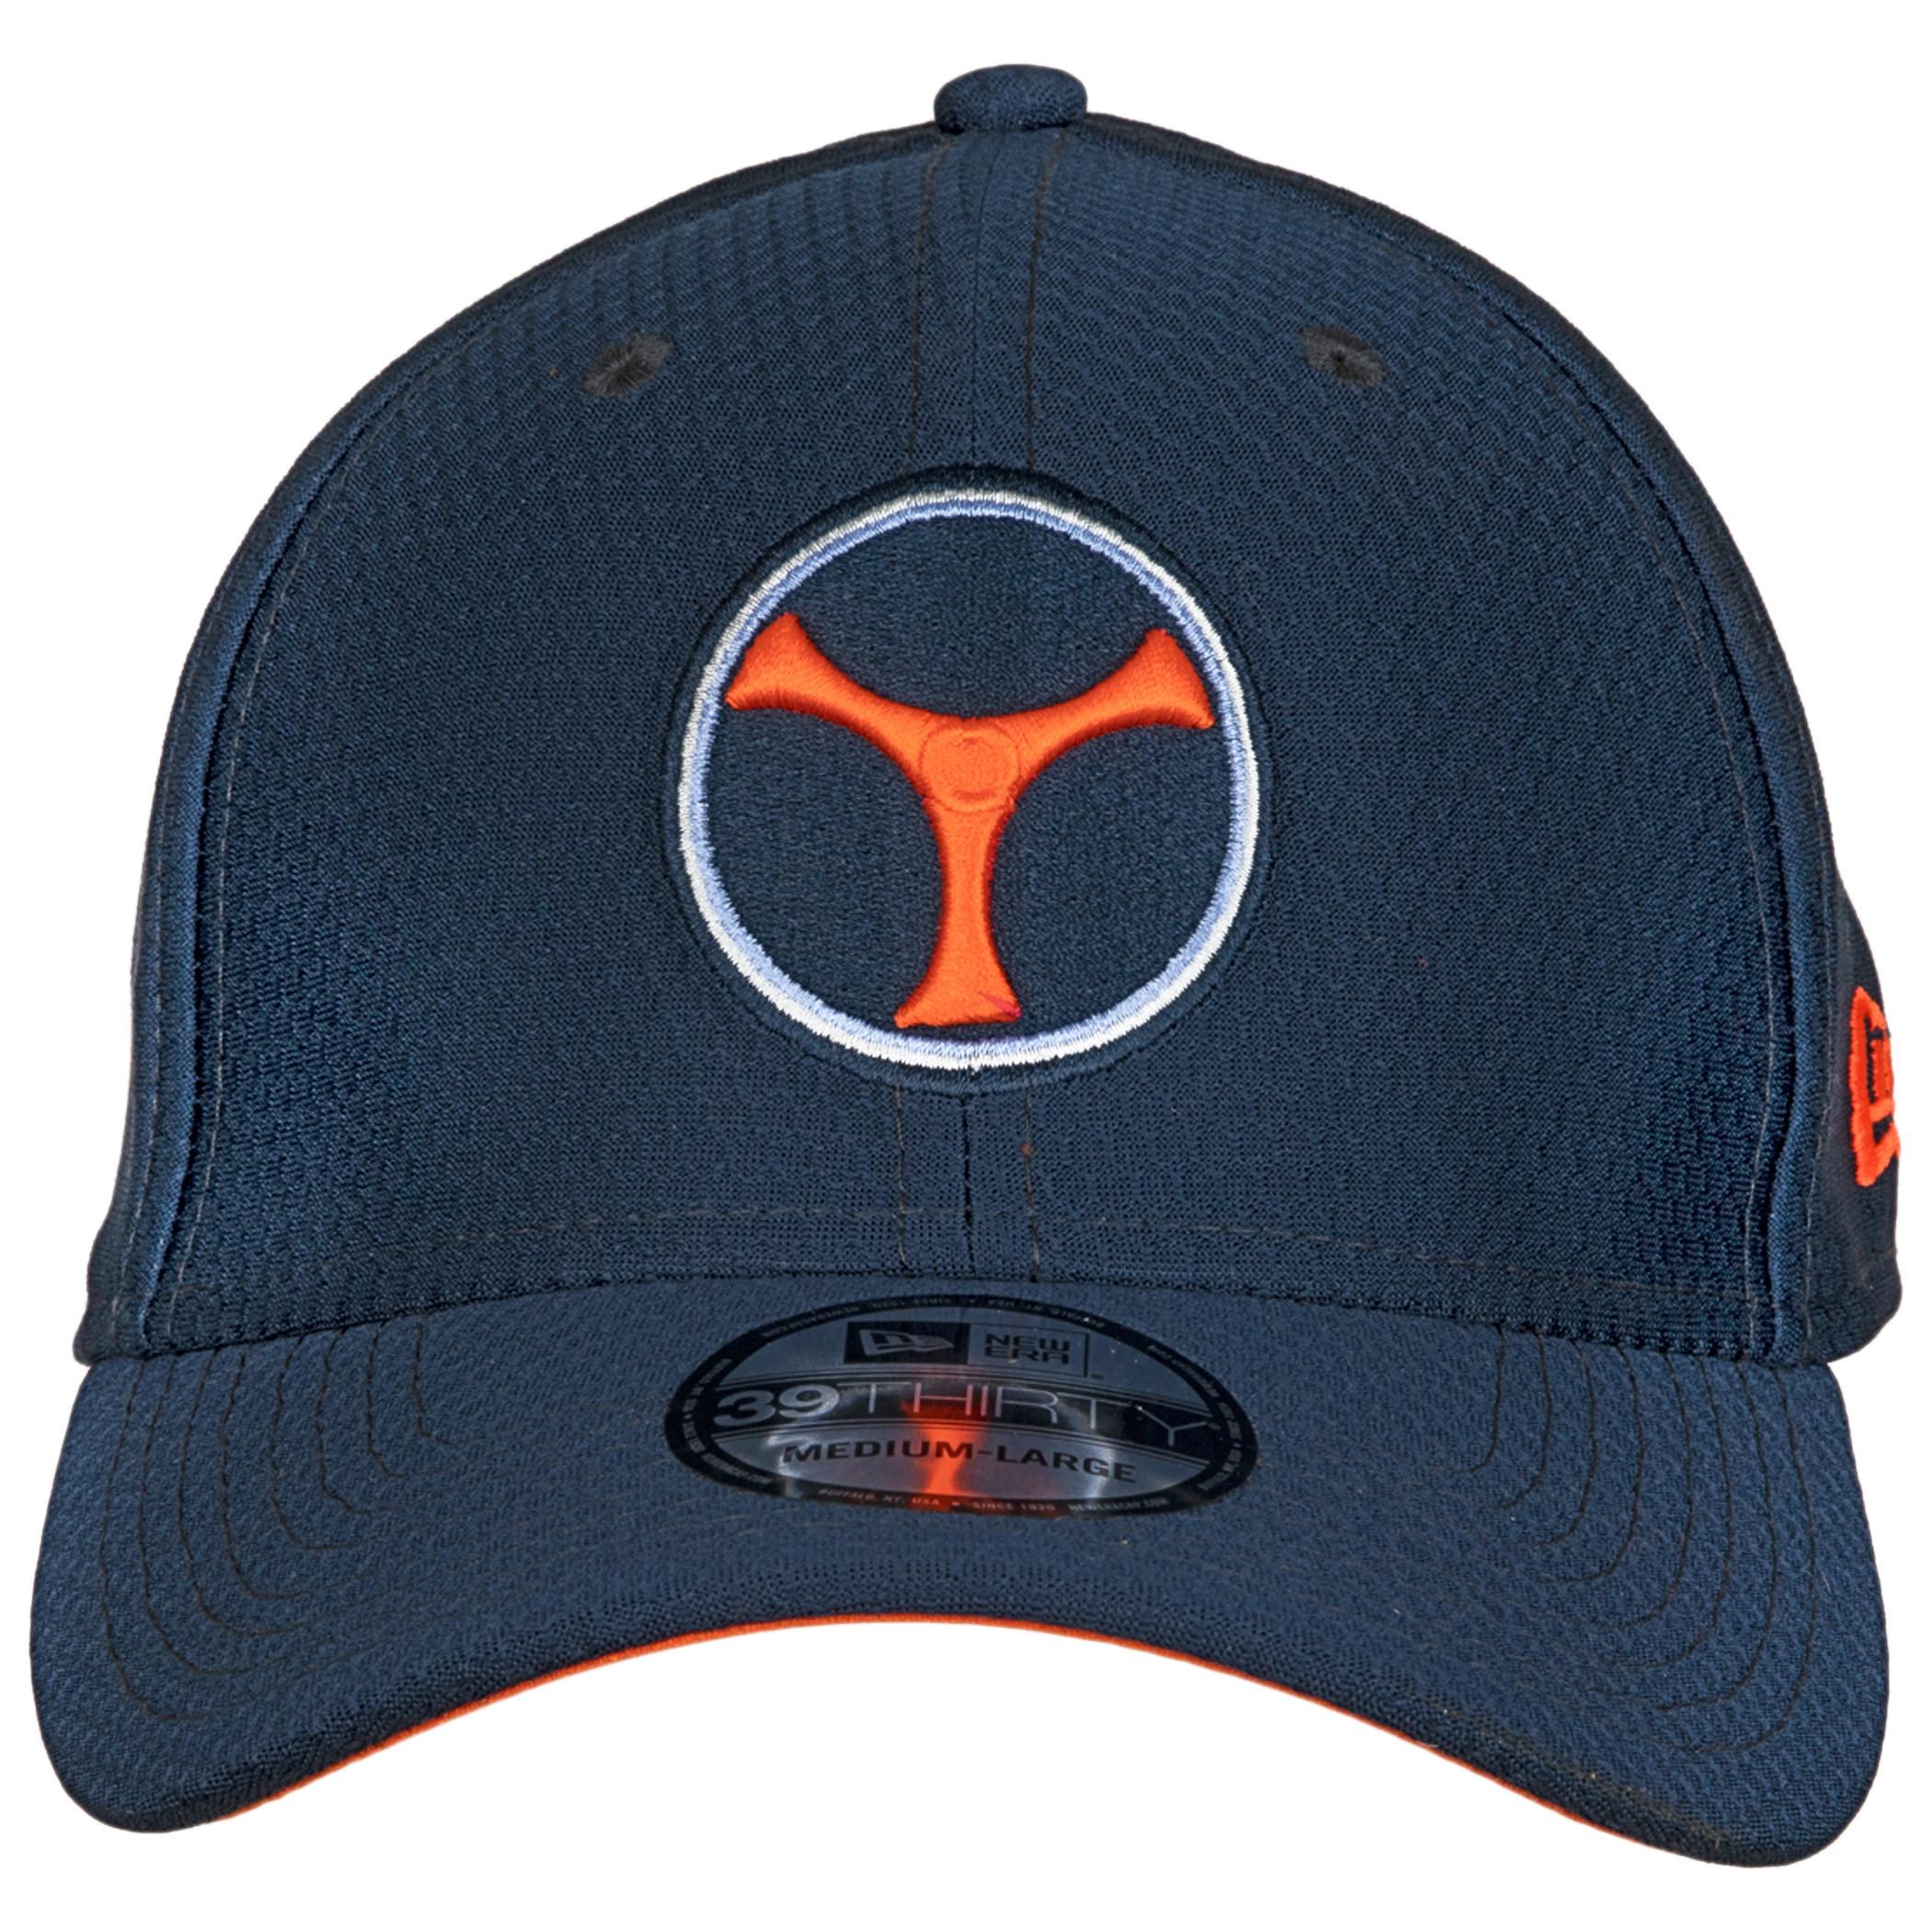 Taskmaster Symbol from Black Widow Movie New Era 39Thirty Flex Fitted Hat